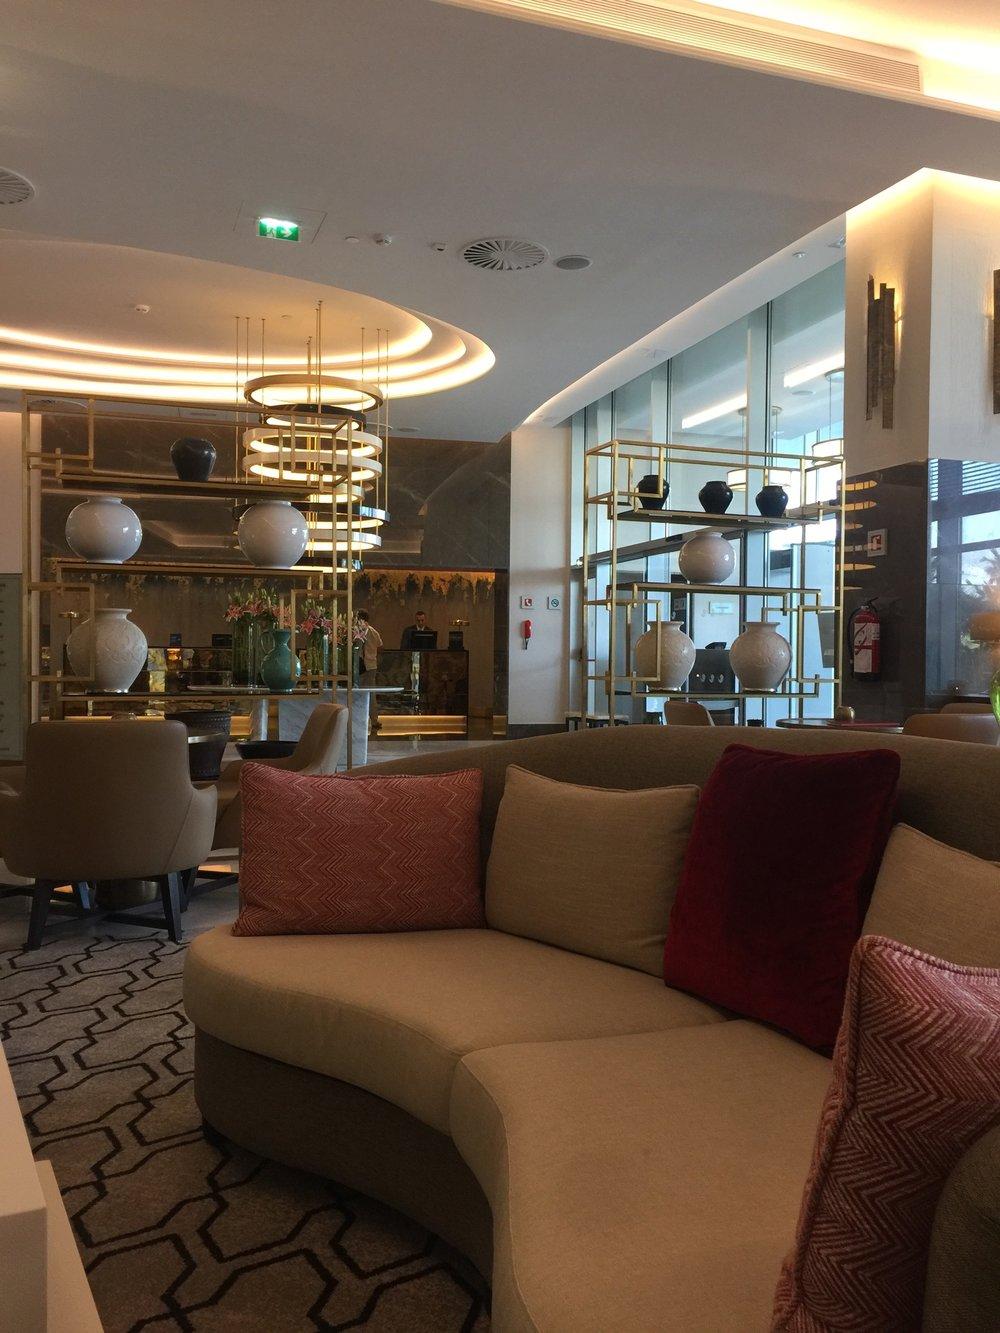 The Tangier Hilton Lobby.JPG